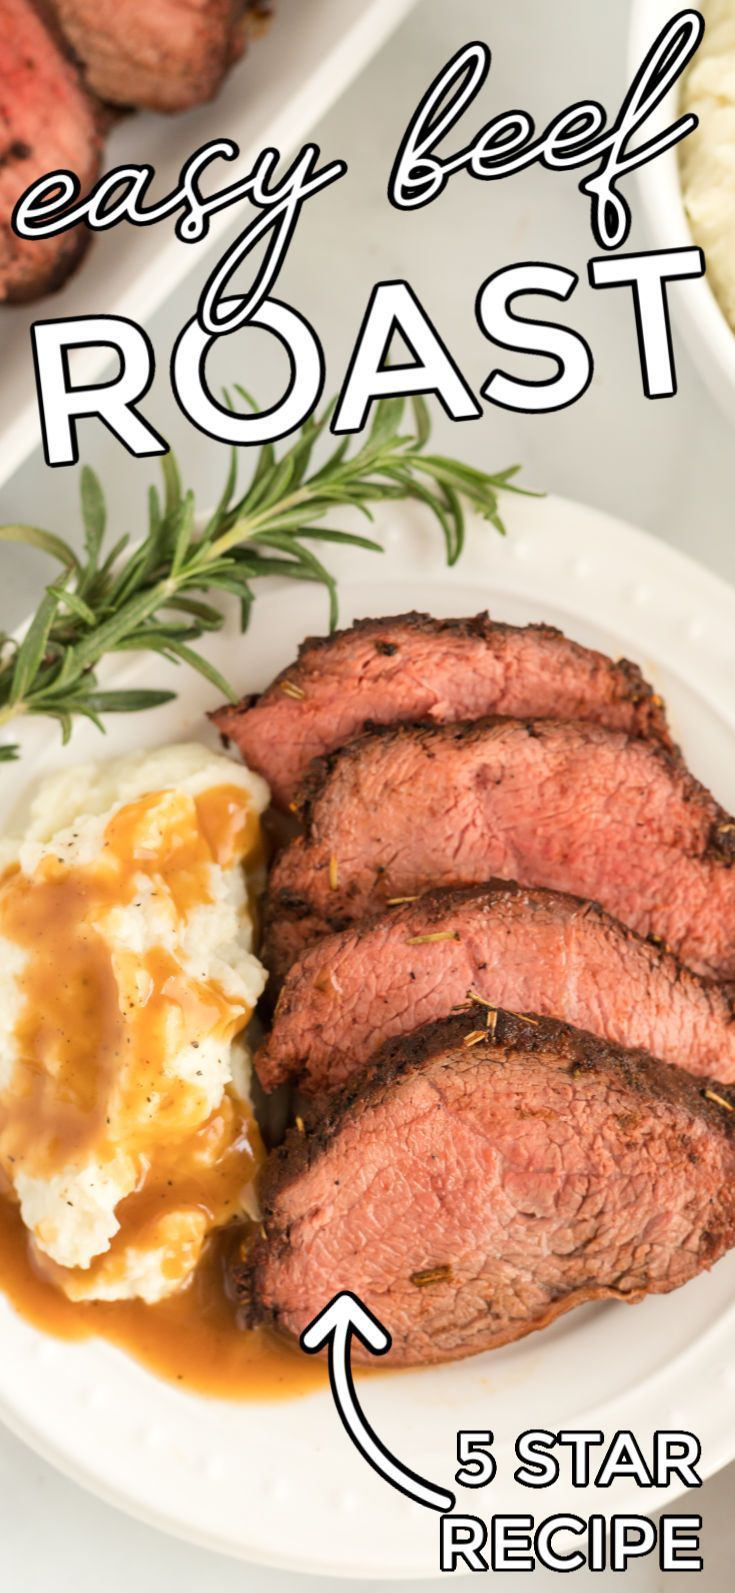 Christmas Beef Chuck Roast Easy Budget Recipes Recipe In 2020 Roast Beef Recipes Oven Roast Beef Recipes Oven Roast Beef